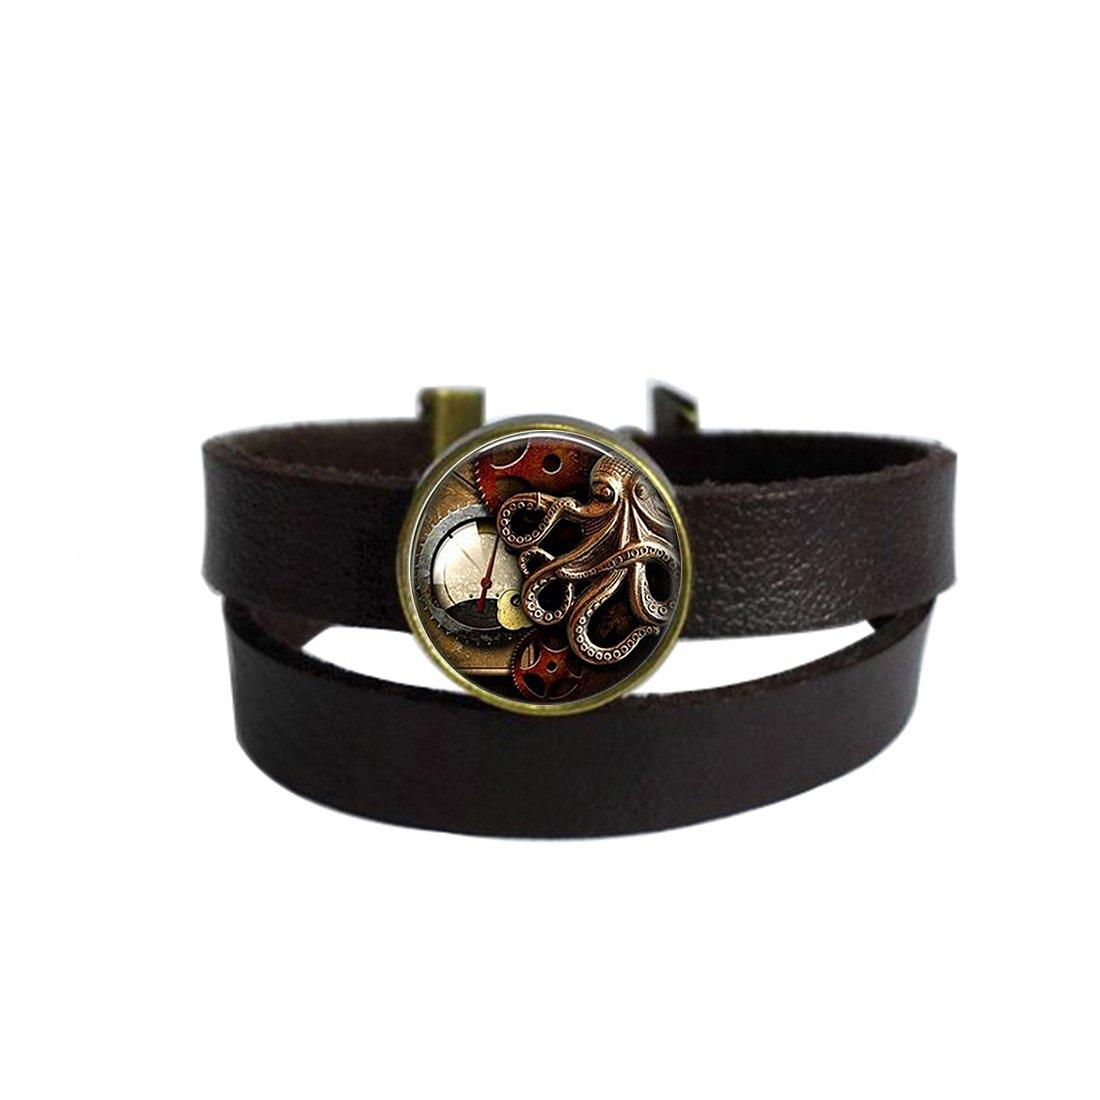 LooPoP Vintage Punk Dark Brown Leather Bracelet Octopus Clock Steampunk Belt Wrap Cuff Bangle Adjustable